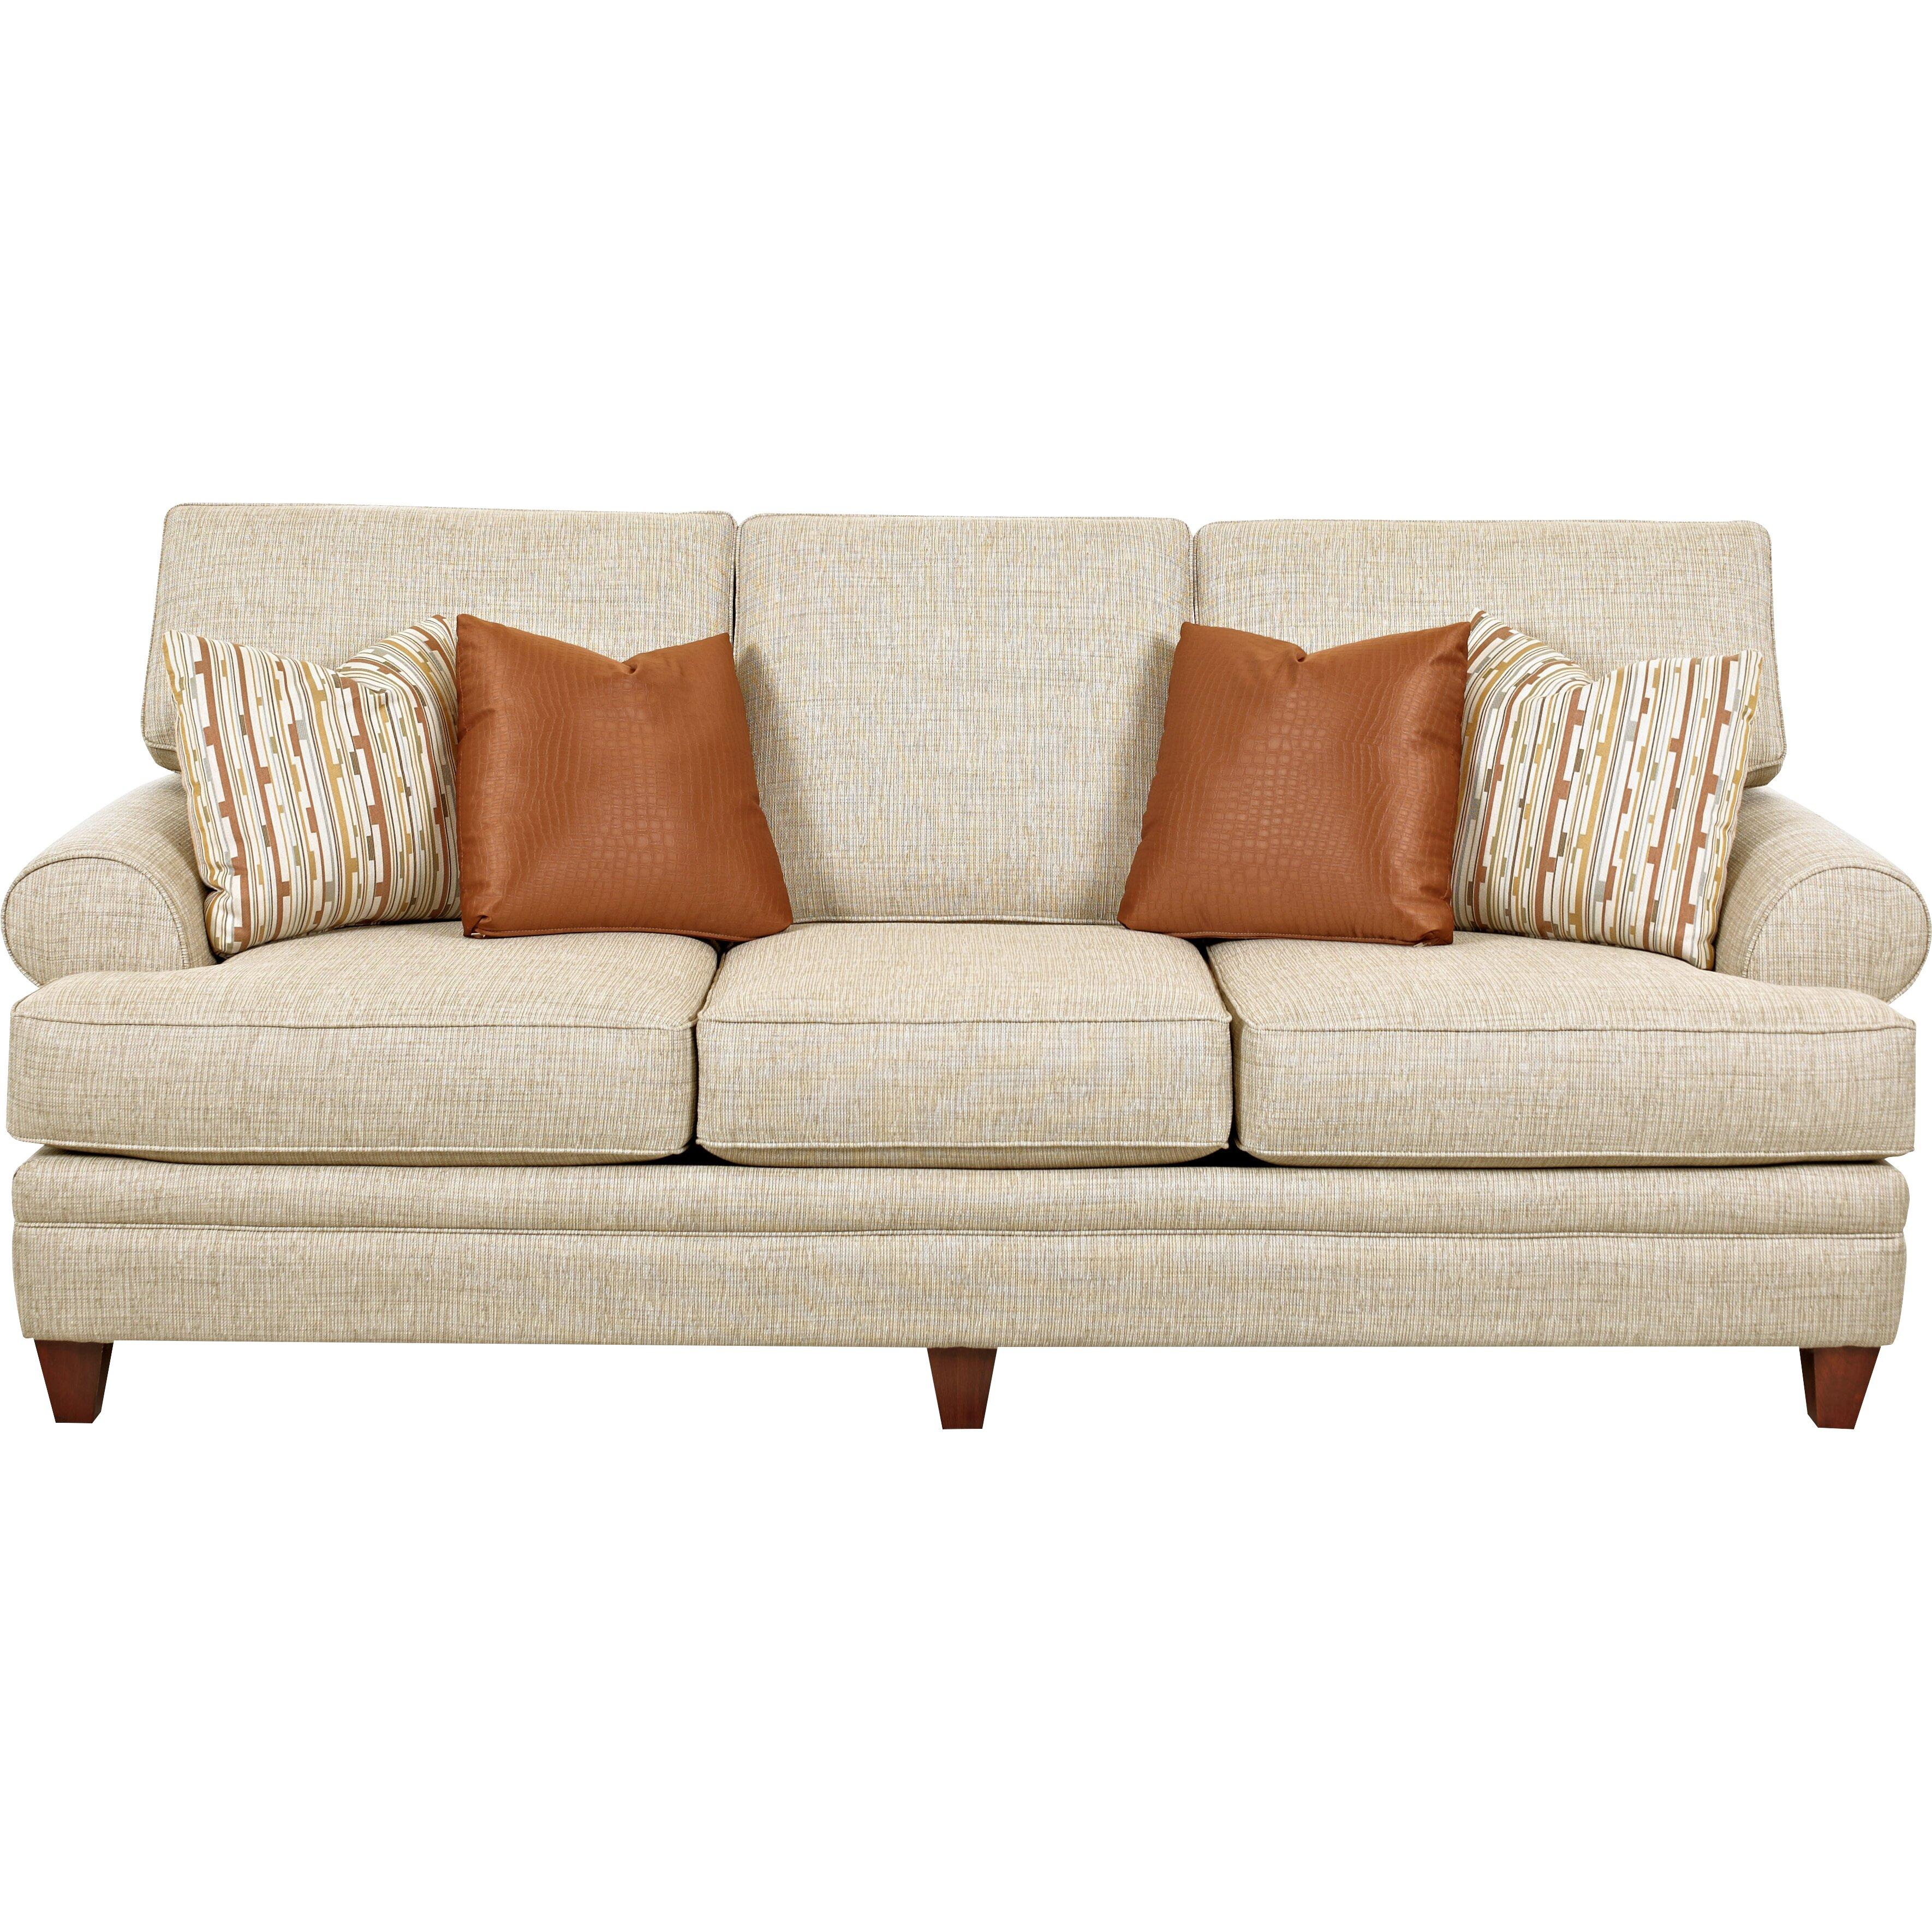 Klaussner Furniture Clayton Sofa | Wayfair